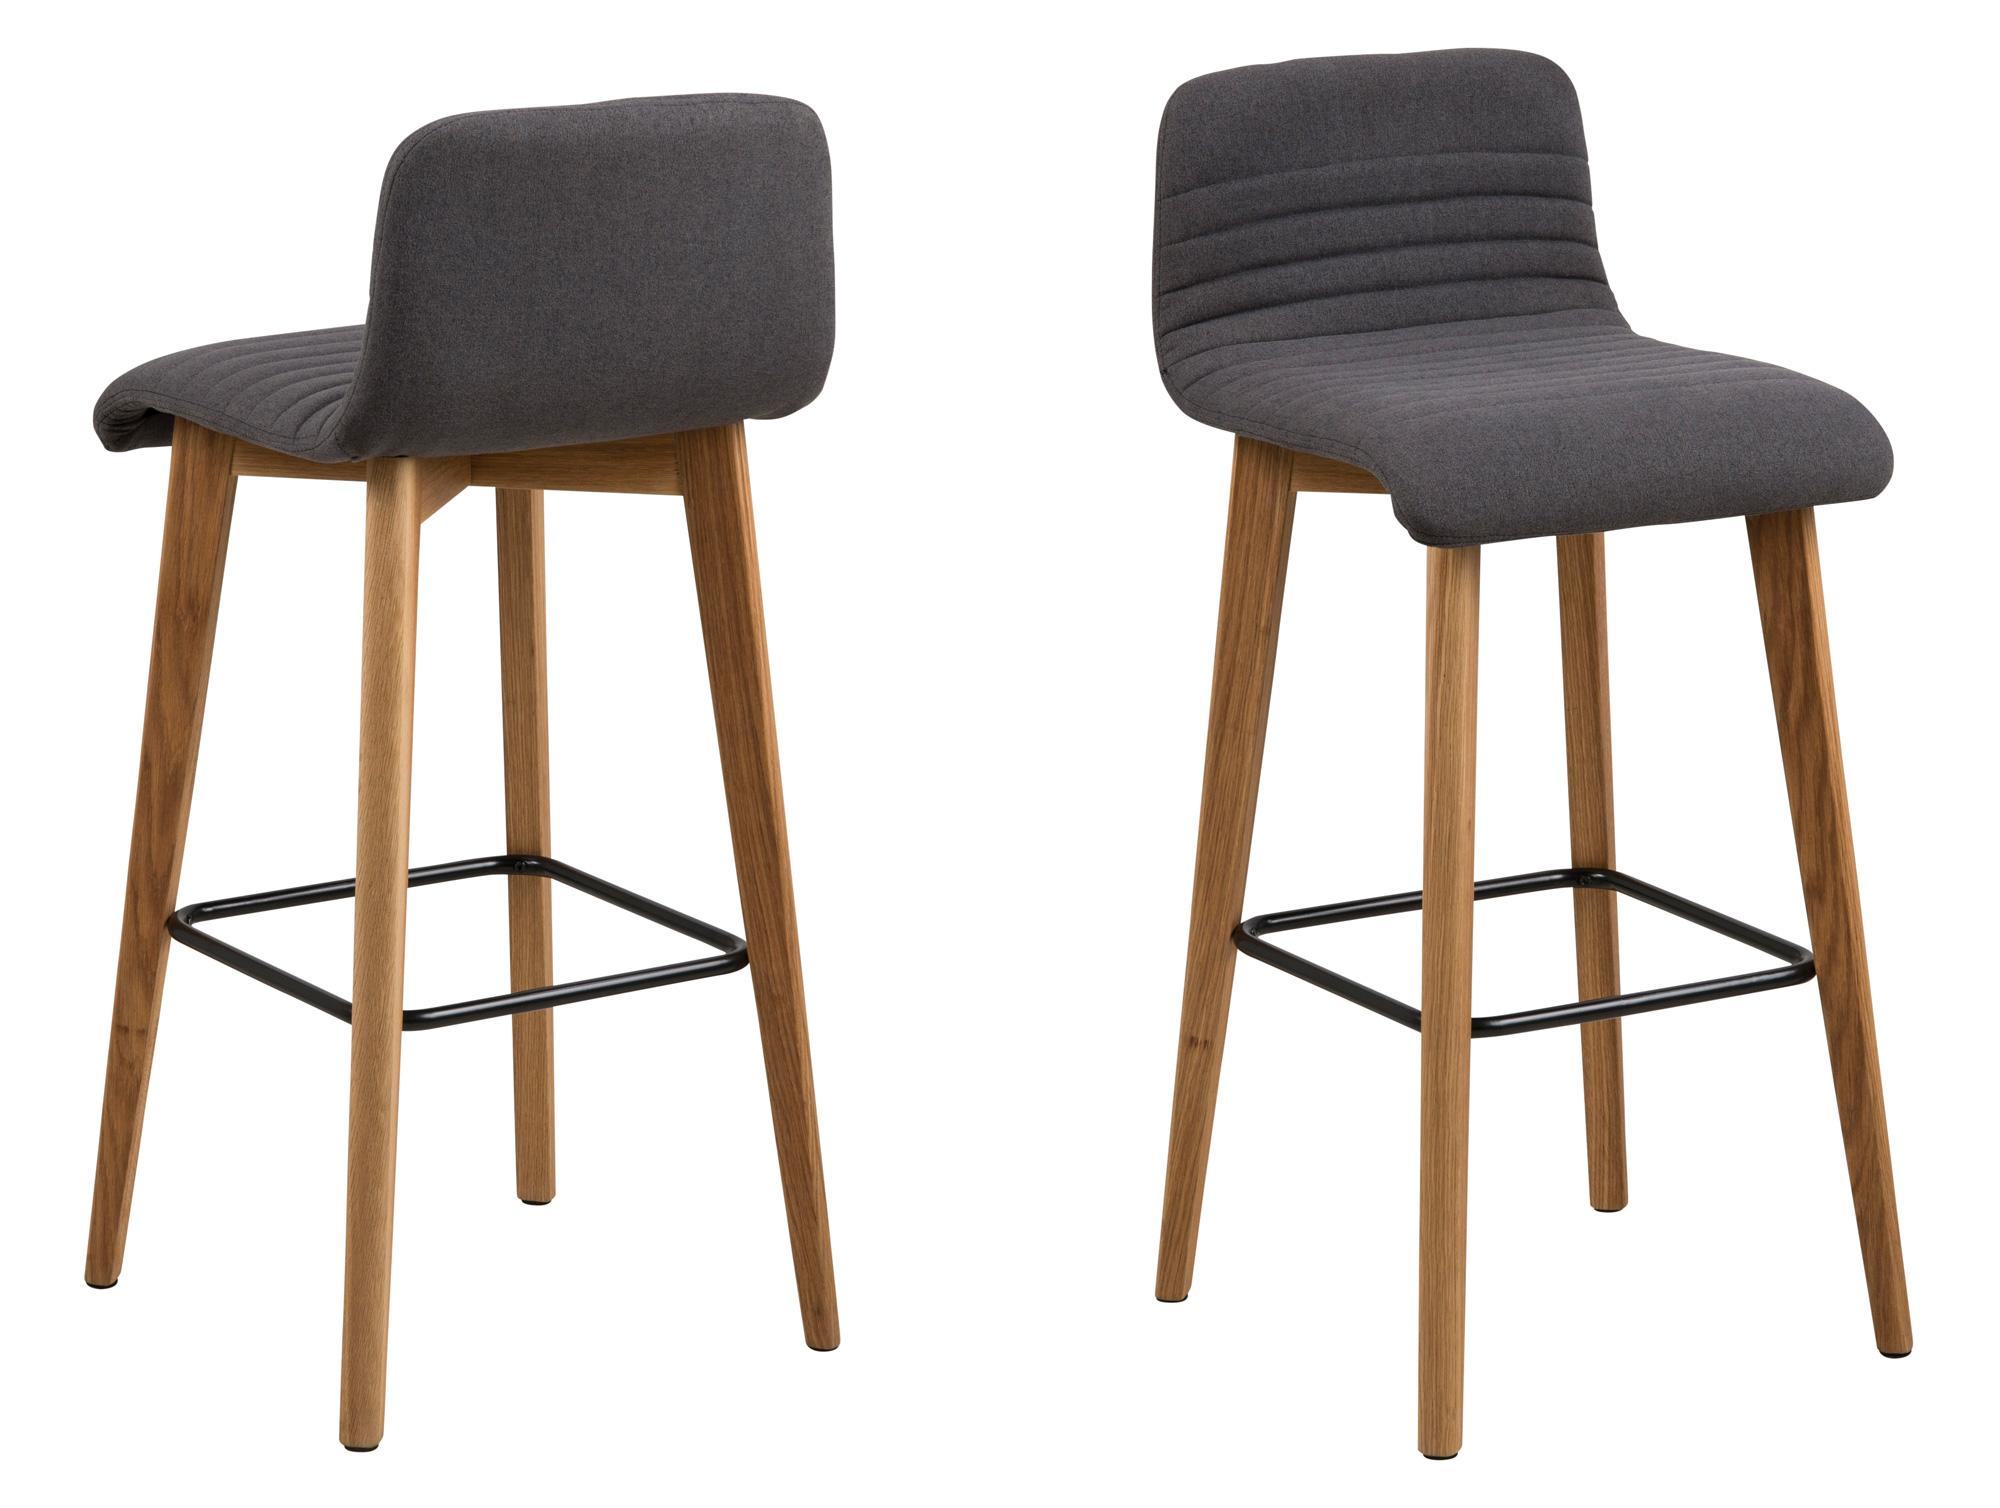 adelia barhocker eiche stoff granada anthrazit 08. Black Bedroom Furniture Sets. Home Design Ideas